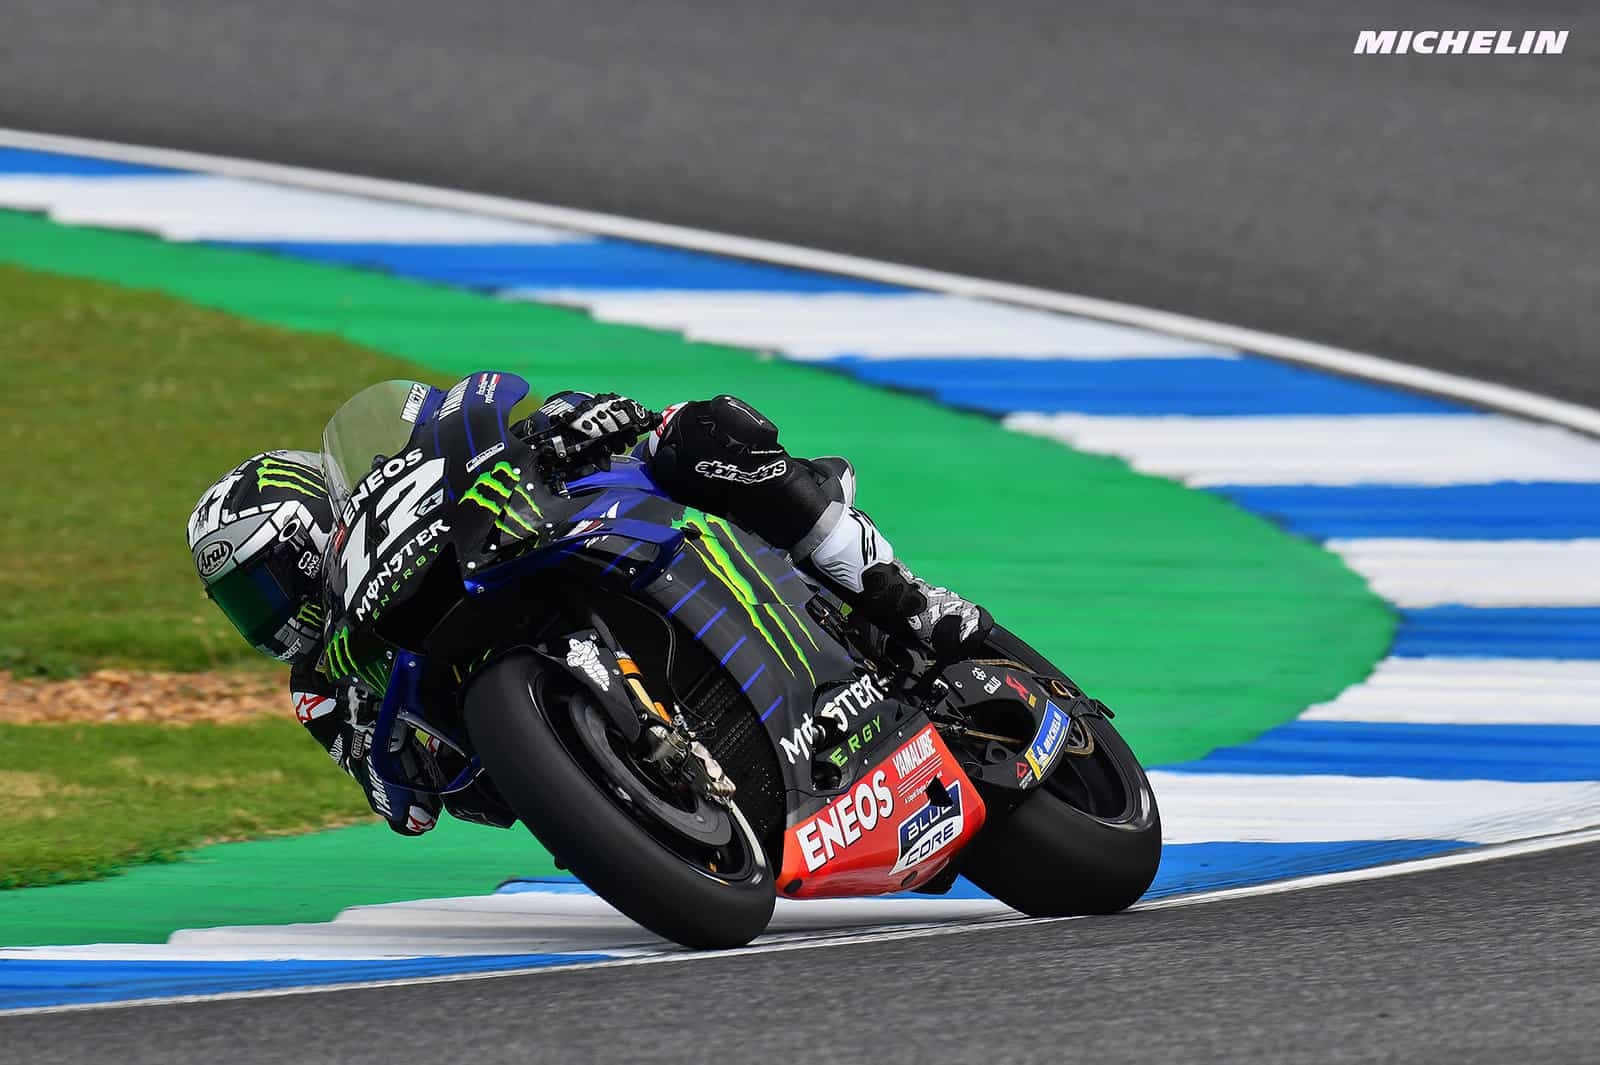 MotoGP2019タイGP FP2 2位ビニャーレス「明日にまた前進出来ると思う」